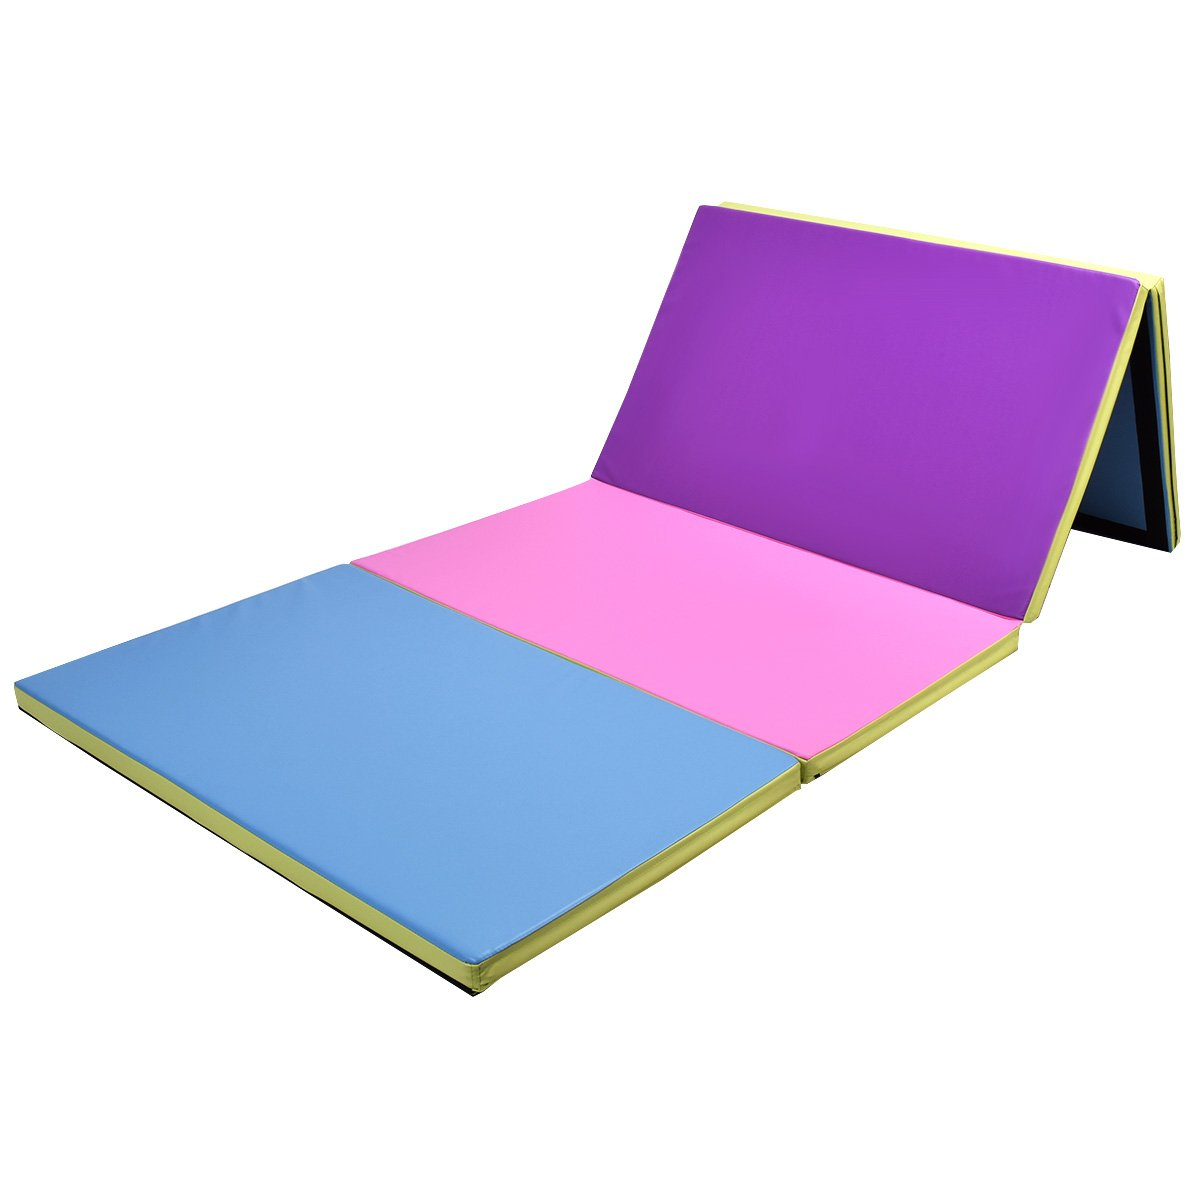 Best Rated In Gymnastics Equipment & Helpful Customer